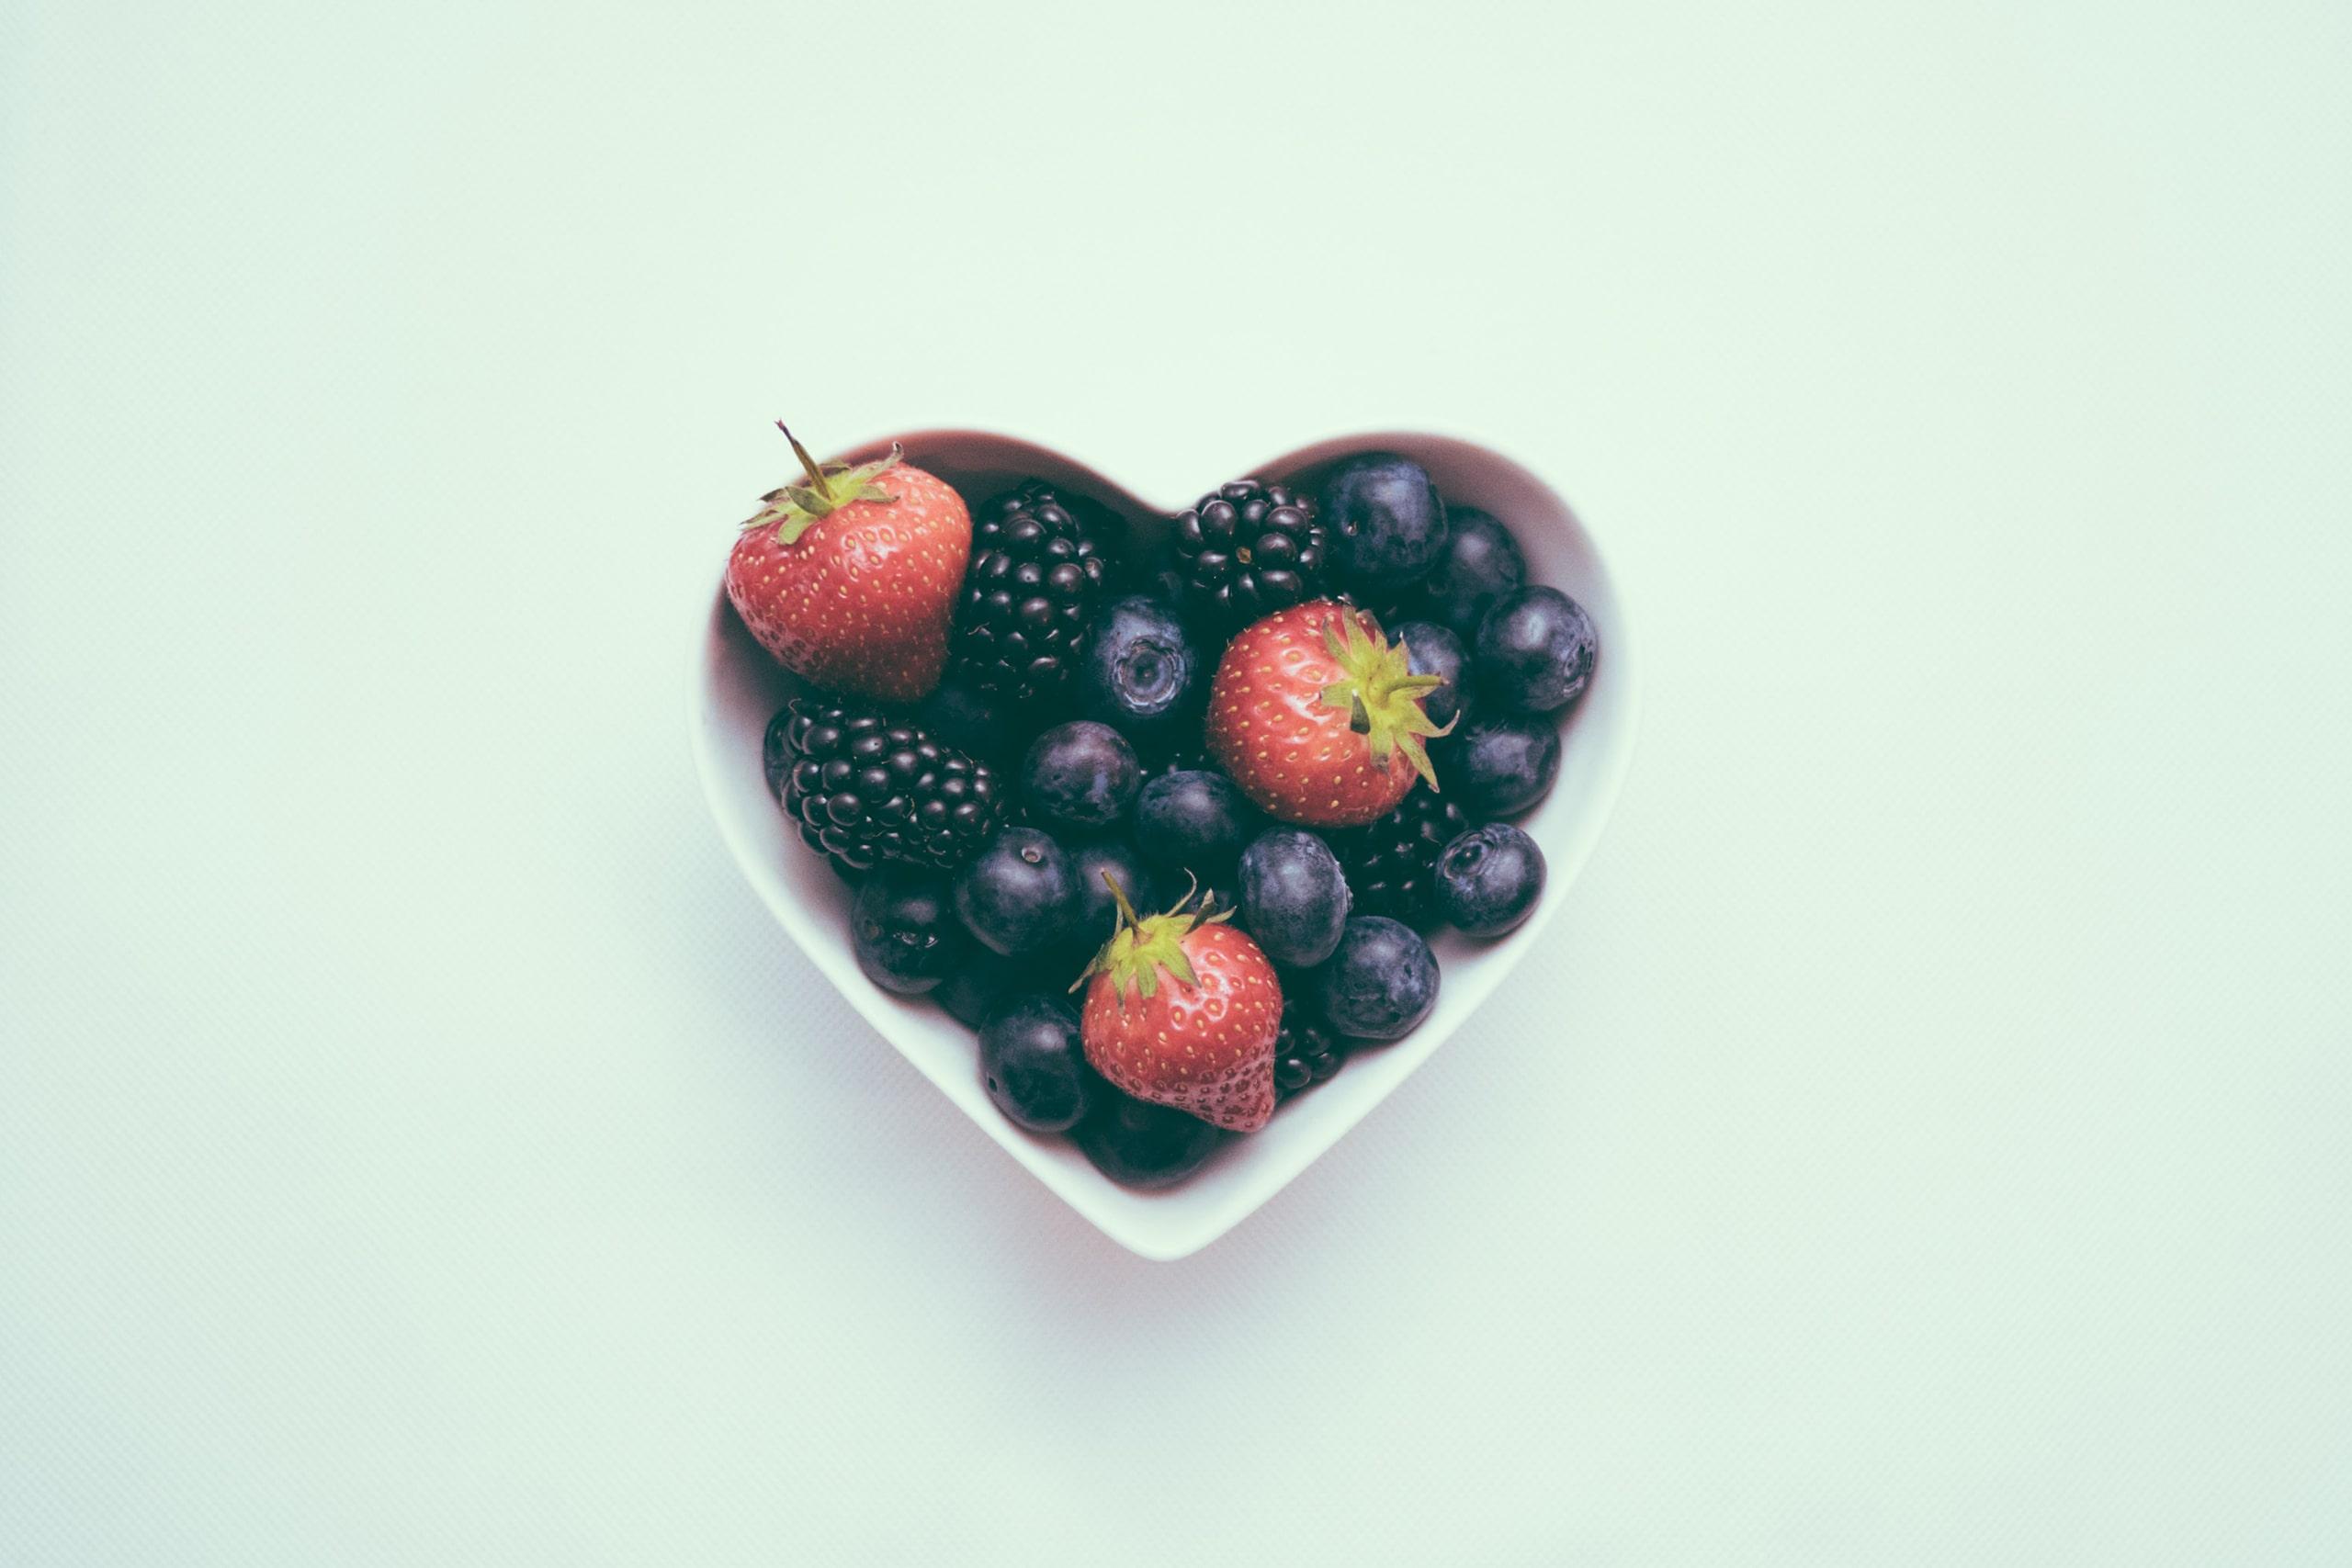 A Happy, Healthy Heart – Daily Self-Care Tips and Bonus Recipe